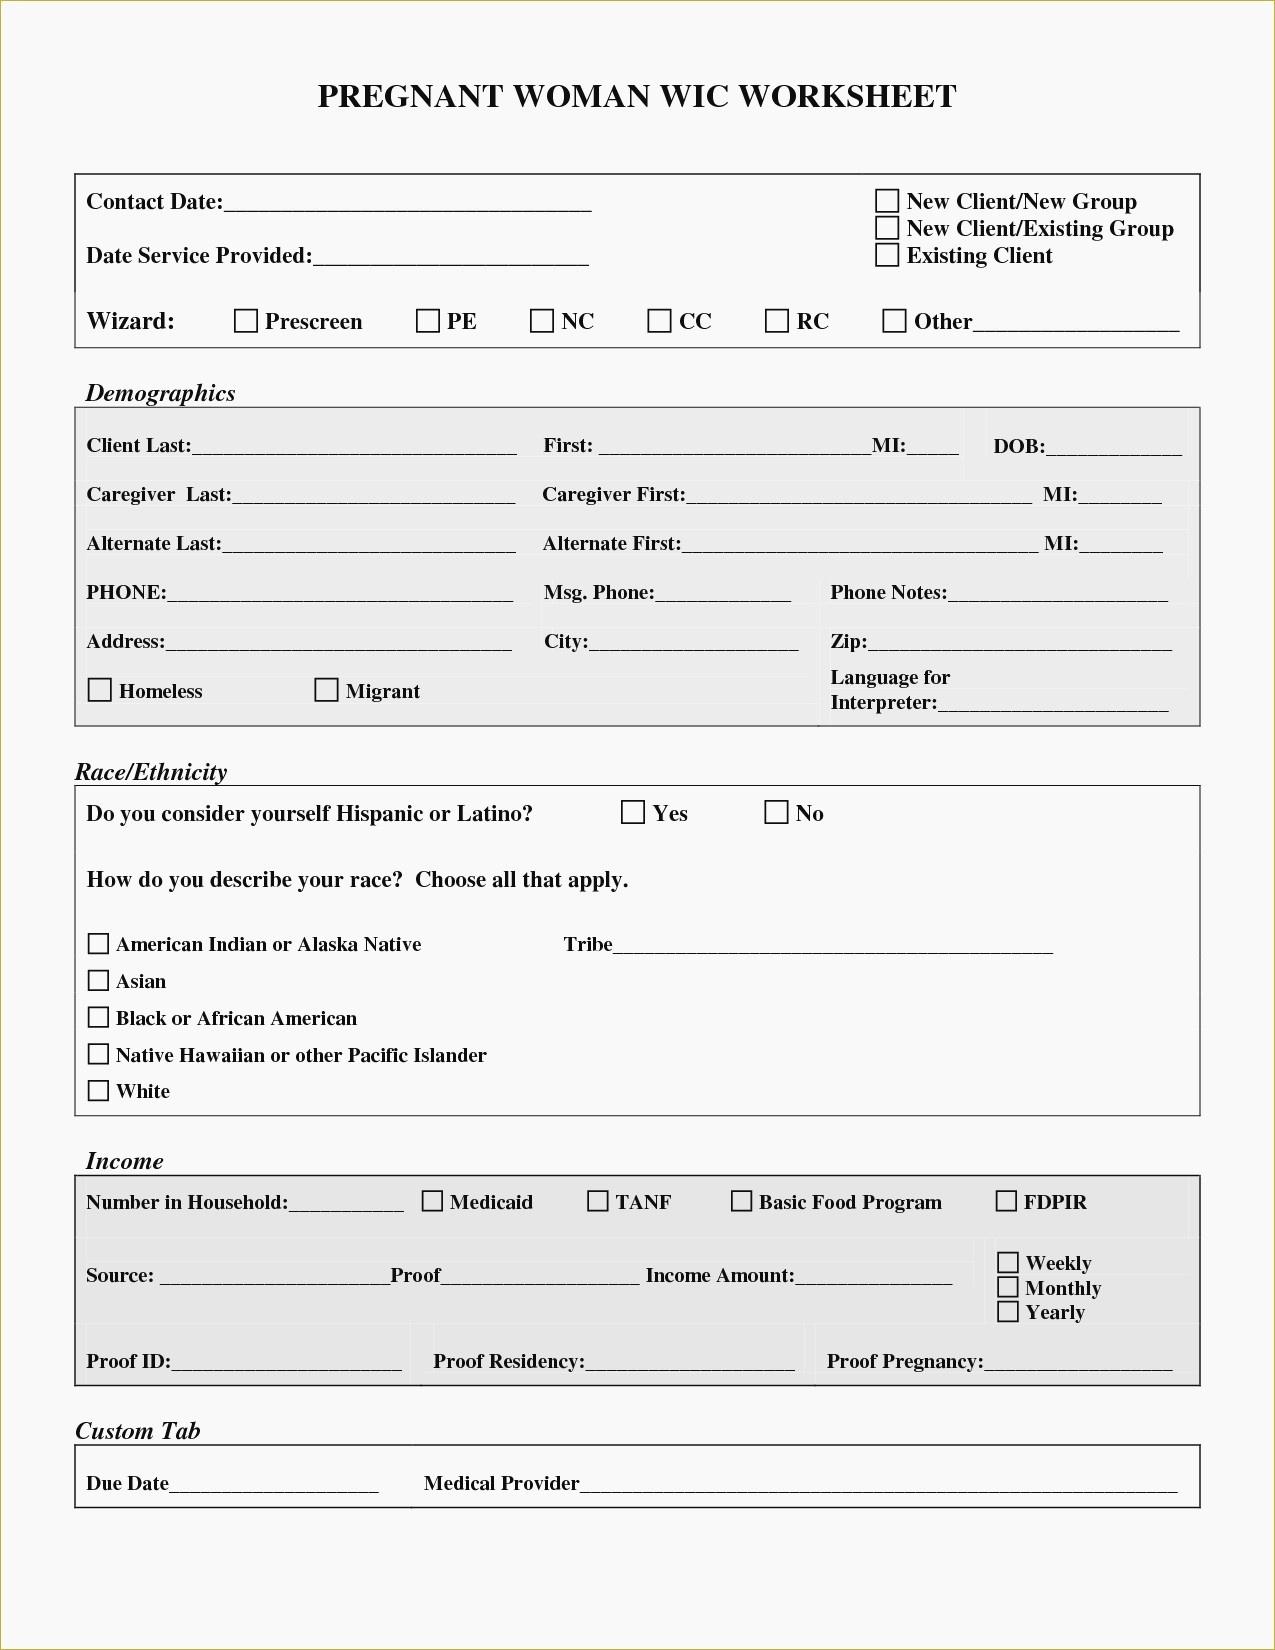 Fake Divorce Papers Luxury Free Printable Fake Pregnancy Papers - Free Printable Fake Pregnancy Papers